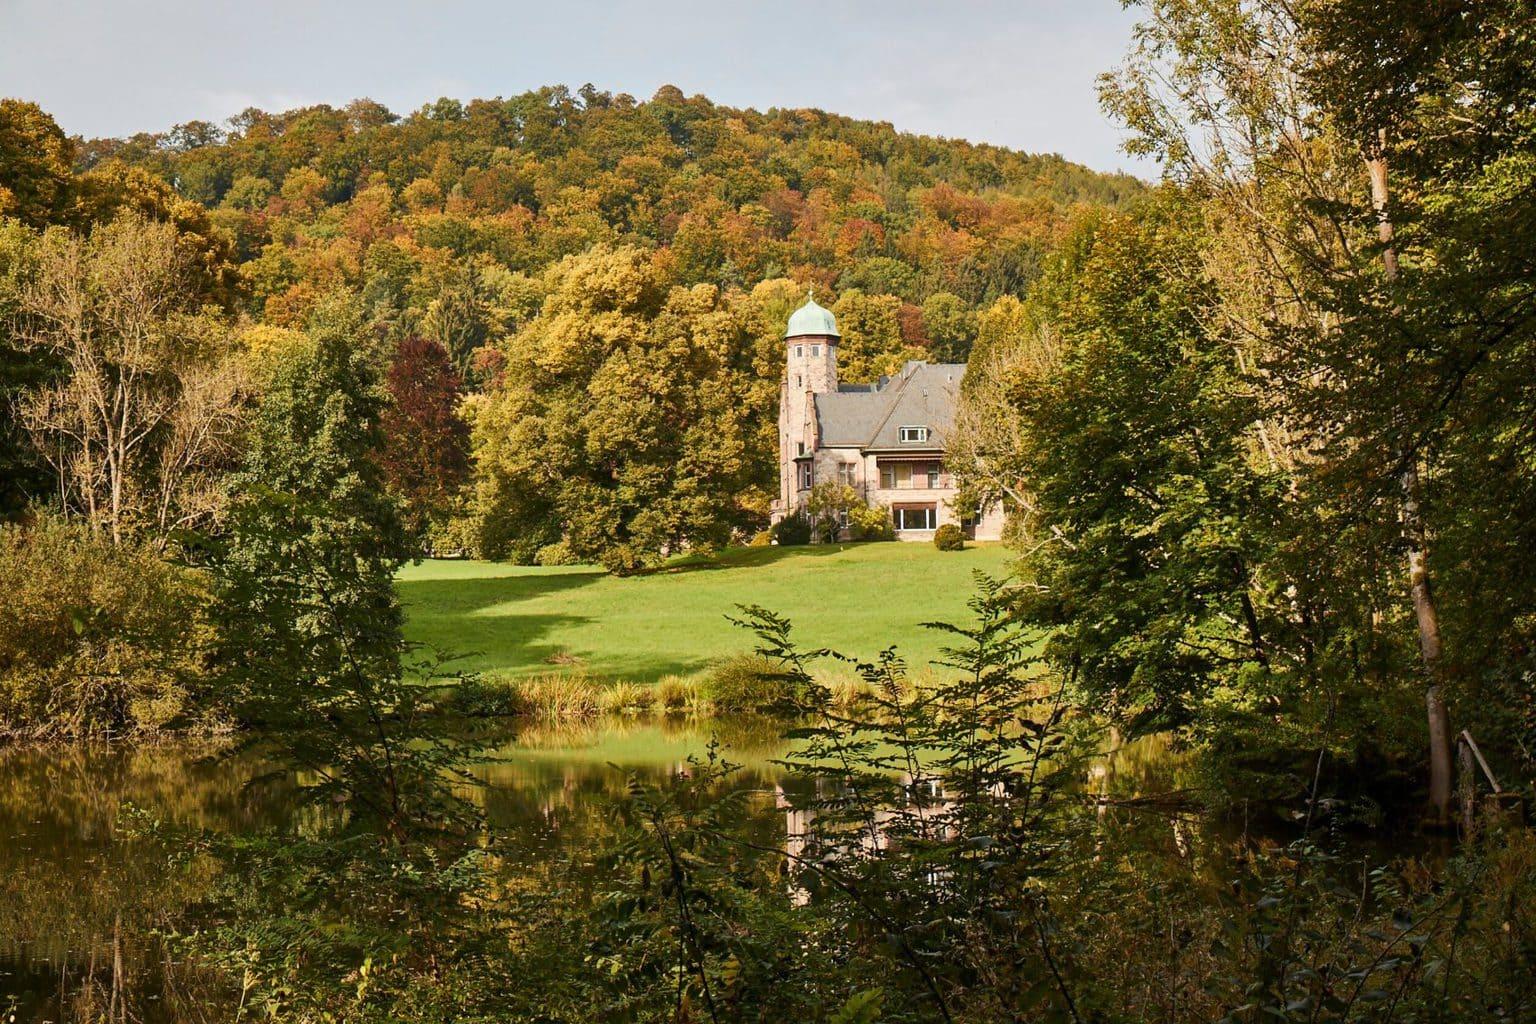 Schlosshotel Hohenhaus